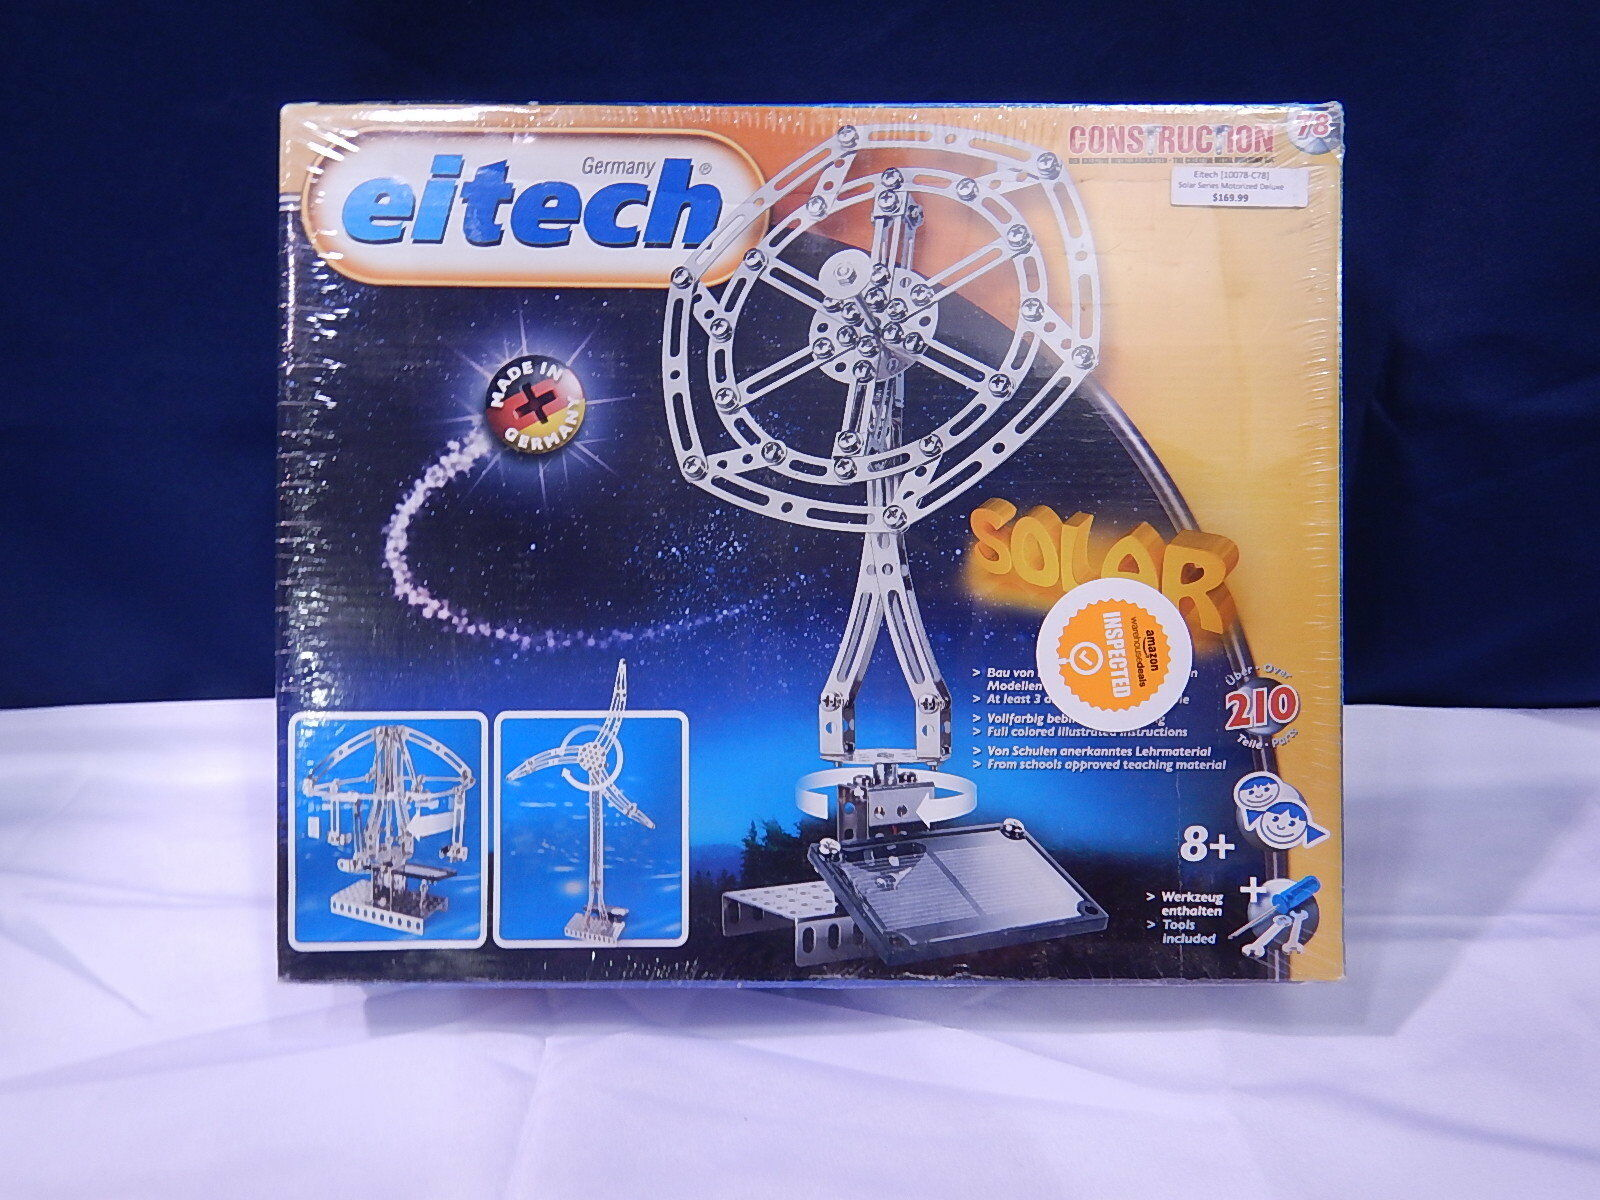 Eitech Solar Metal Building Construction C78 Deluxe 210 Pc Kit w Motor T1